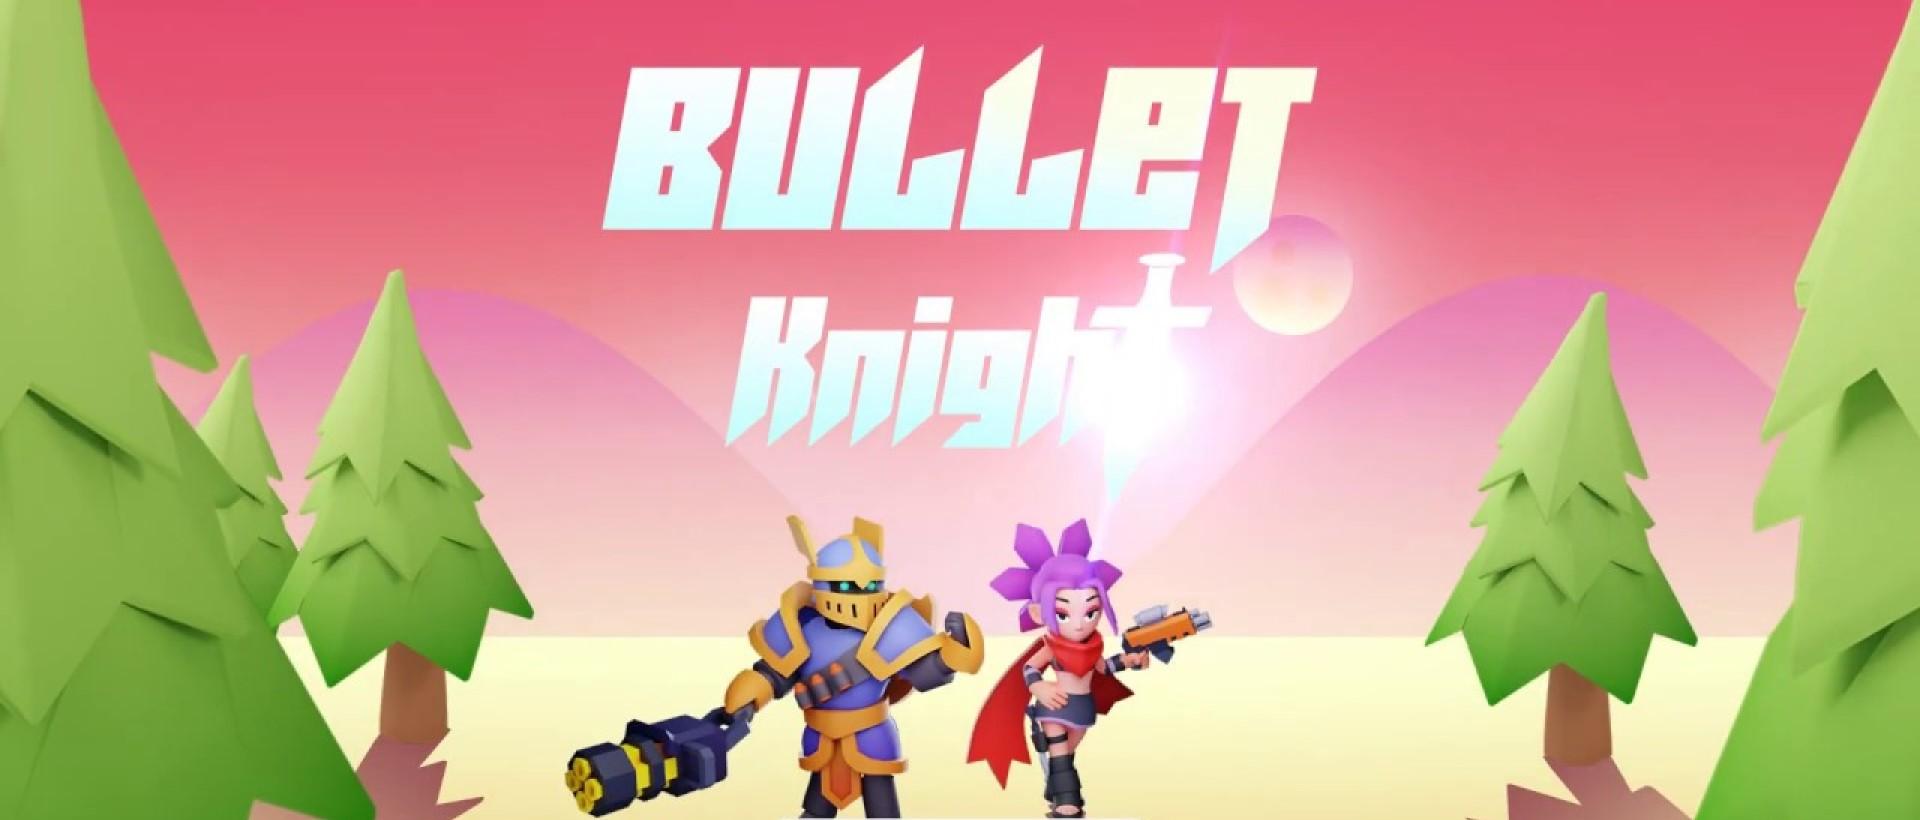 Bullet Knight: Dungeon Crawl Shooting Game